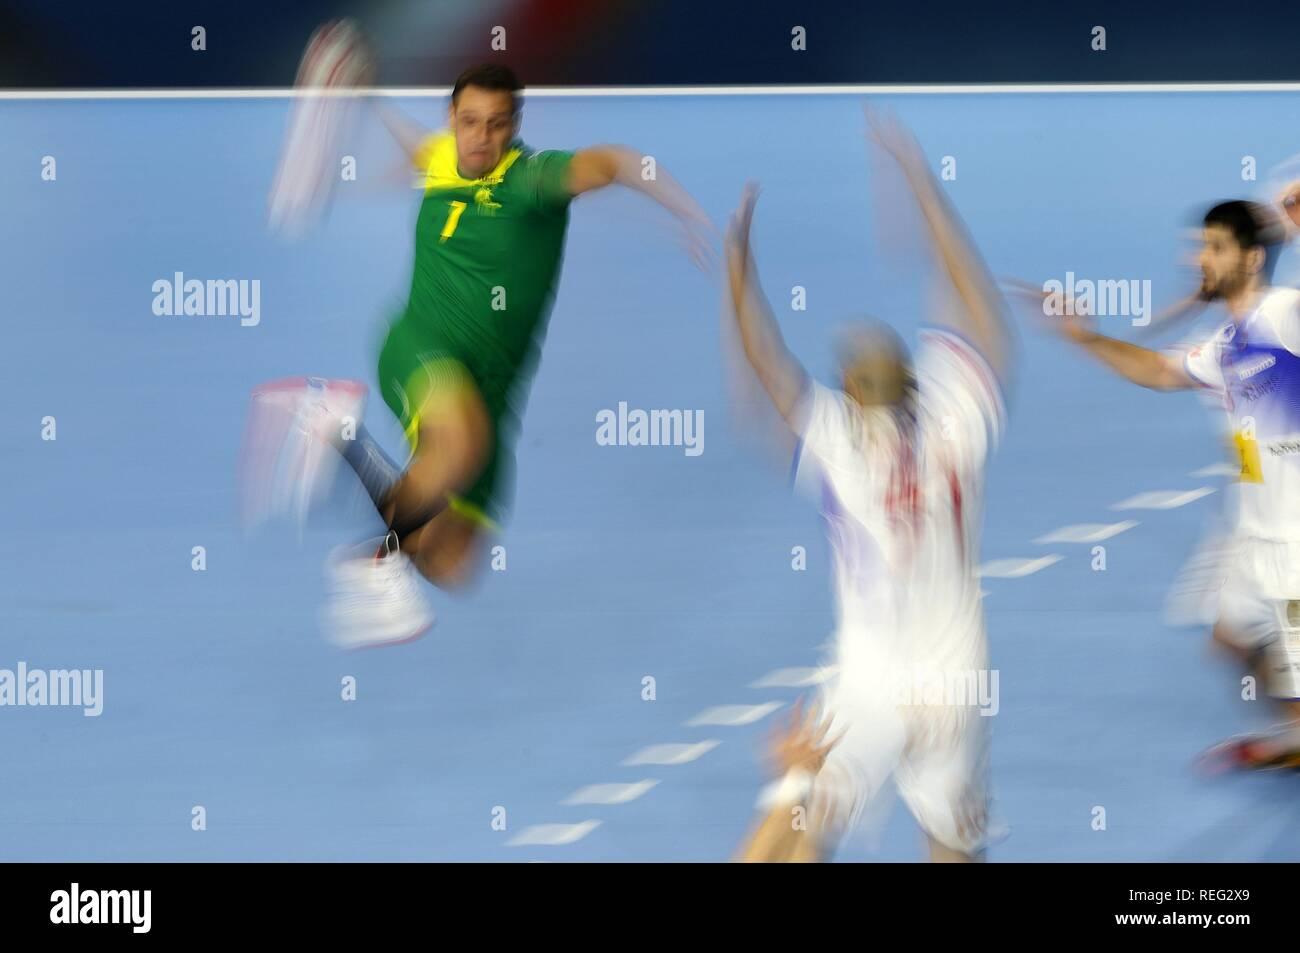 firo: 21.01.2019, Handball: World Cup World Cup Main Round Brazil-Spain Feature, blurred, general, depositors, background   usage worldwide - Stock Image